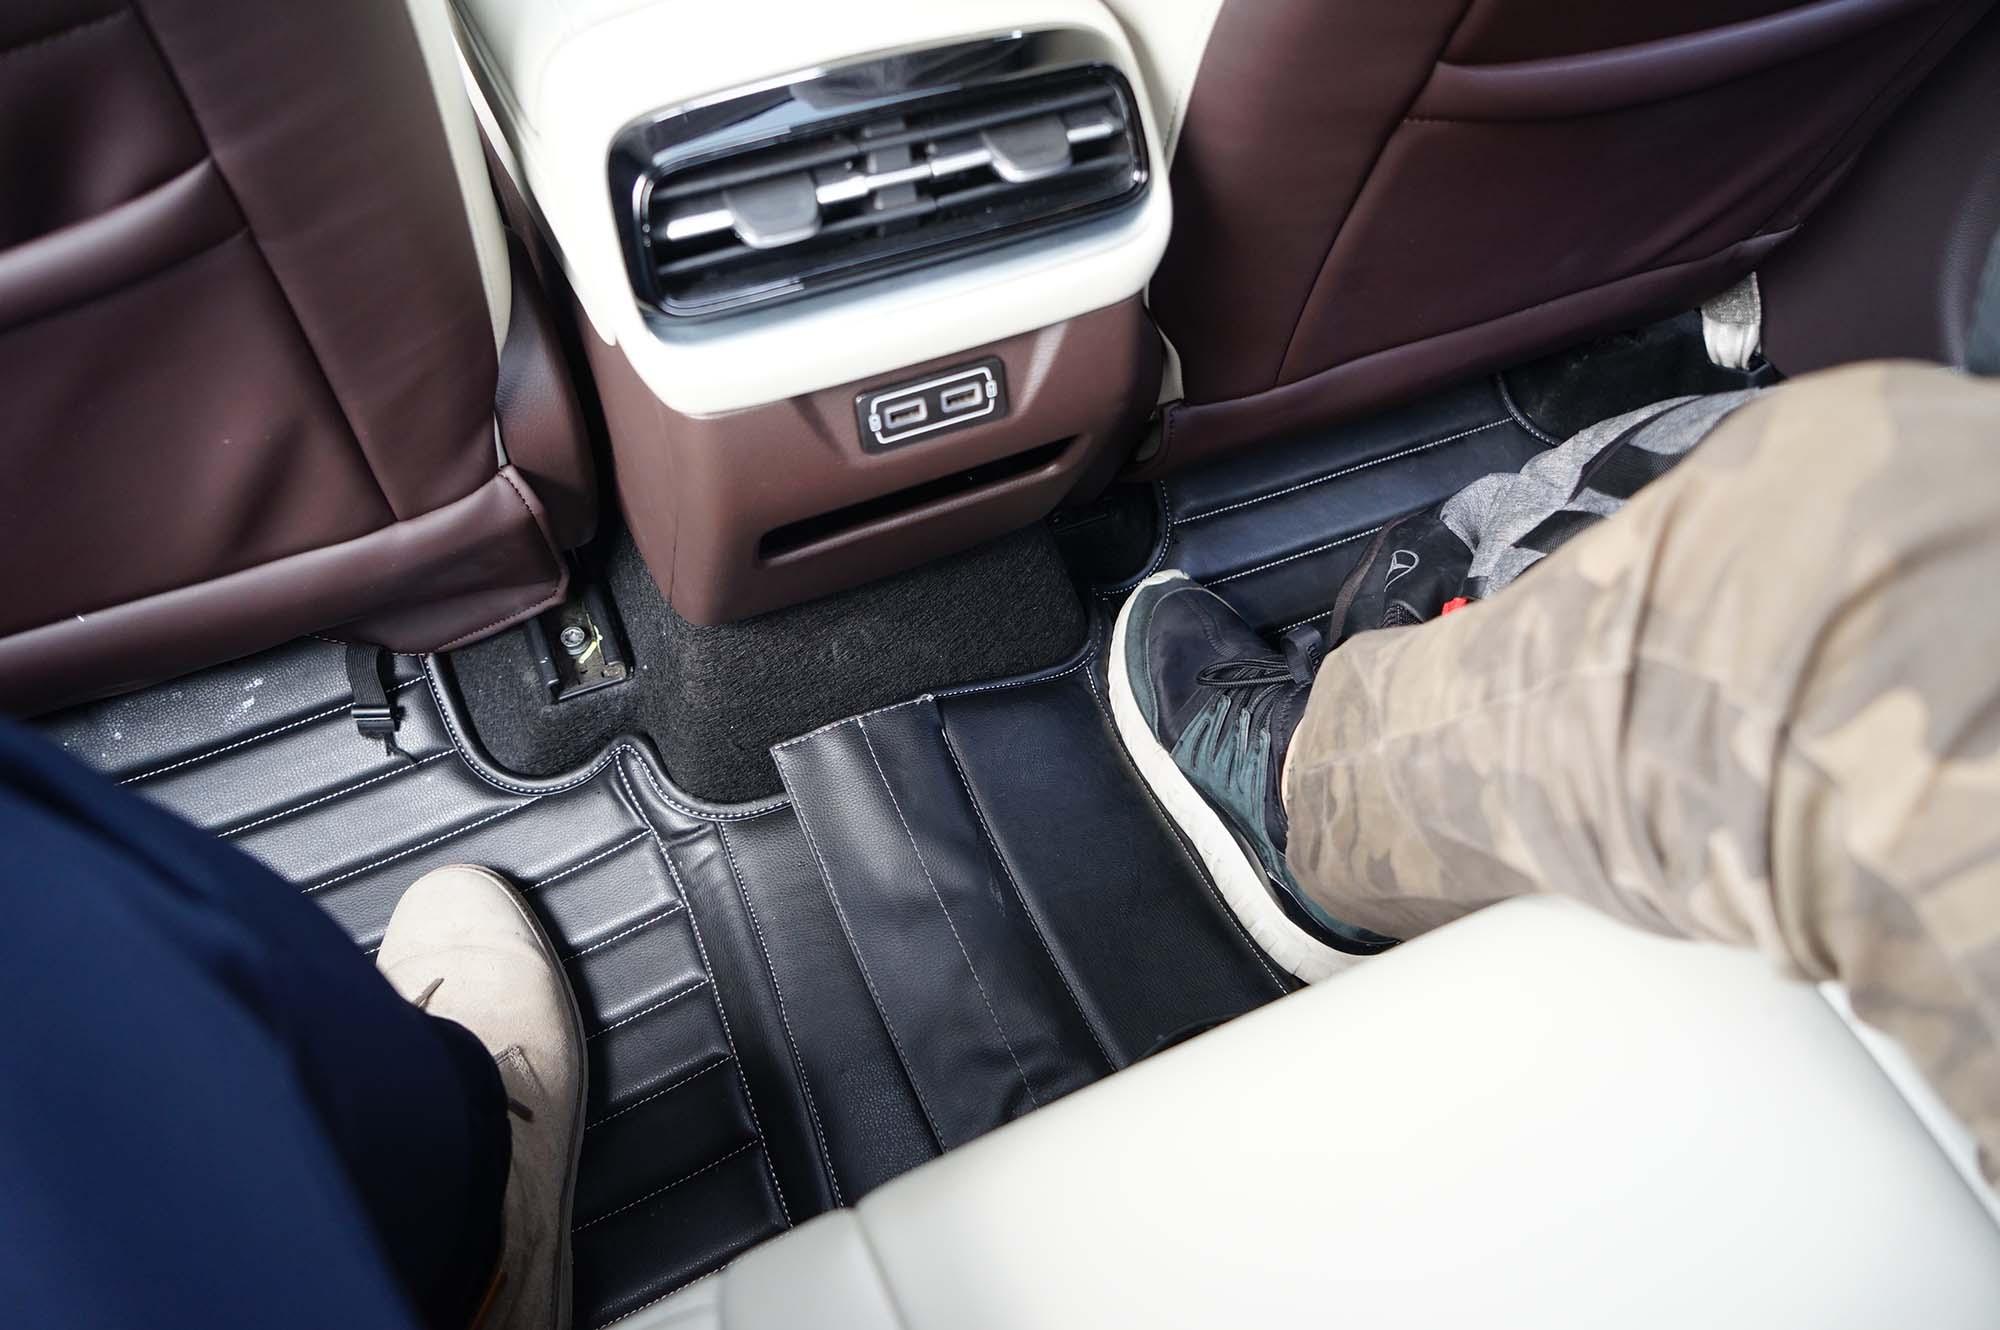 Aion S预售发布会wsgxo01